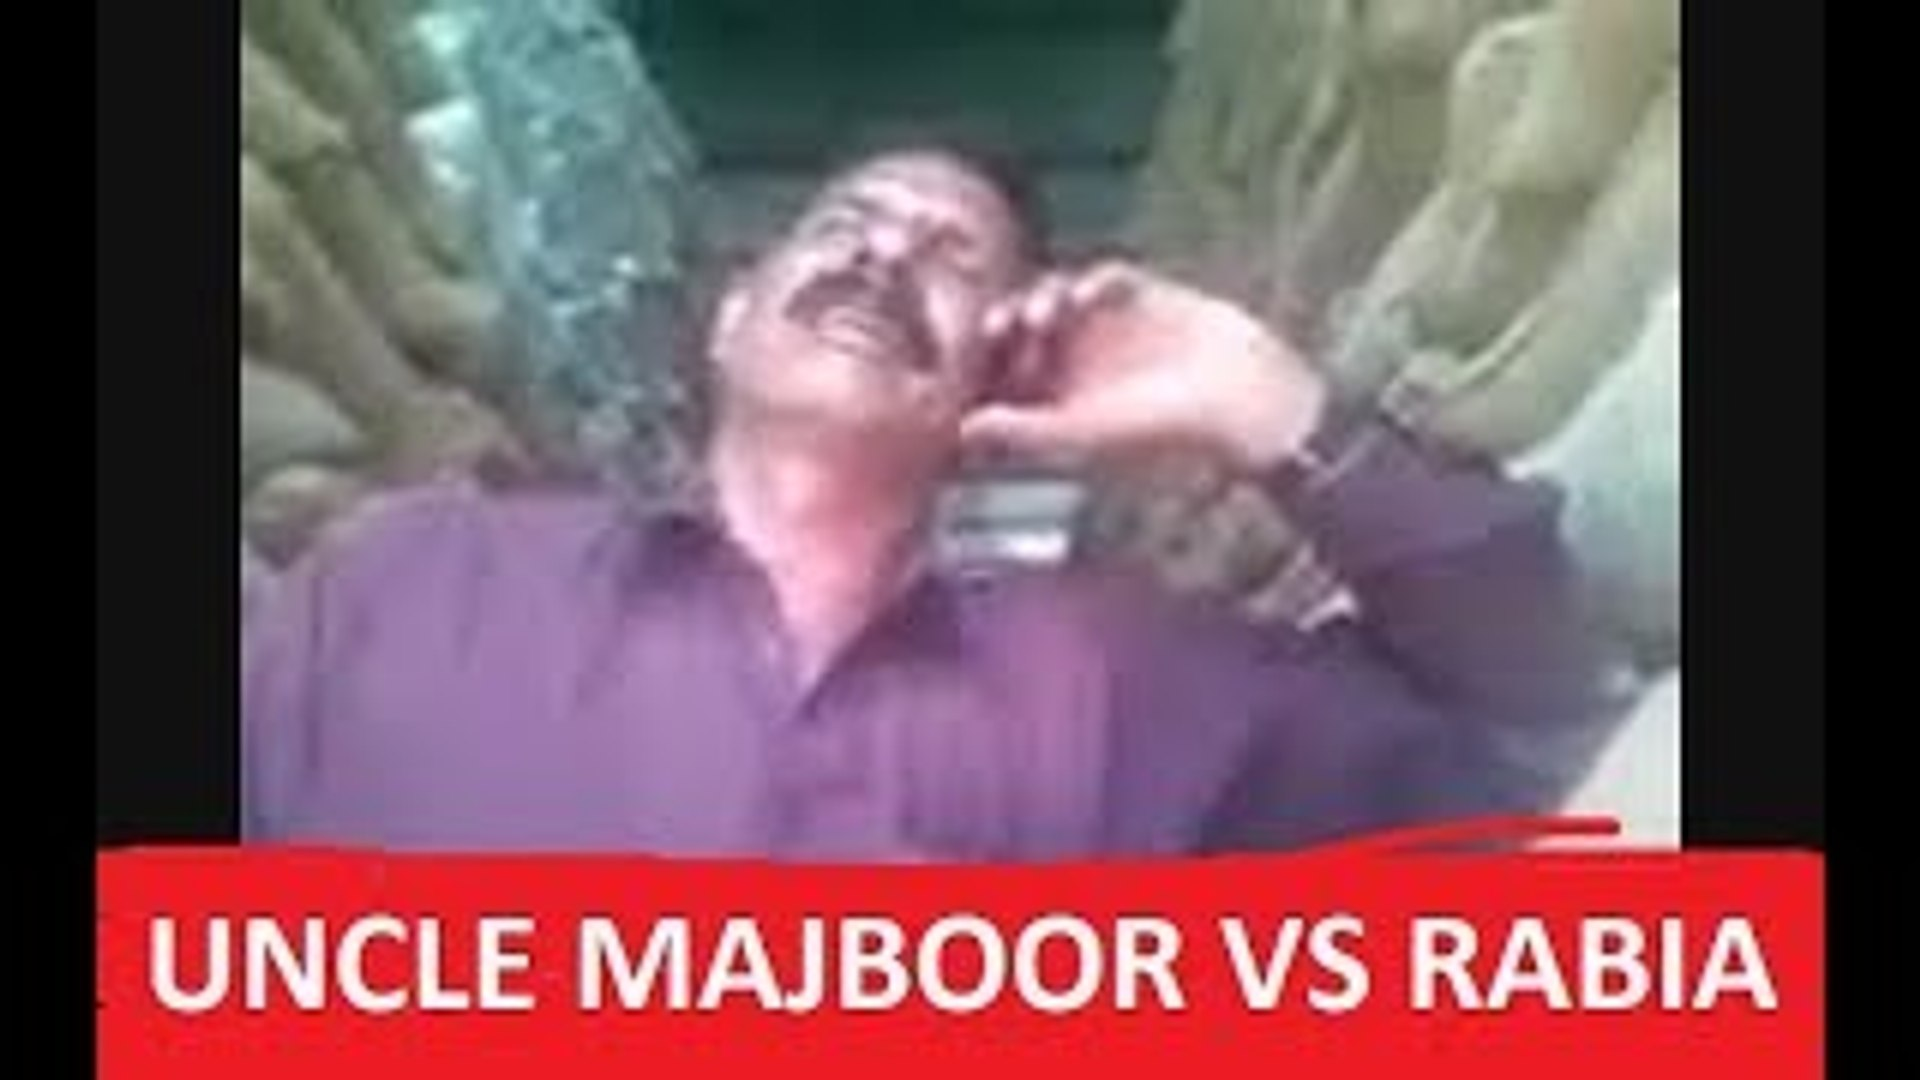 Uncle Majboor vs Rabia - Full Funny Video by legend of fun